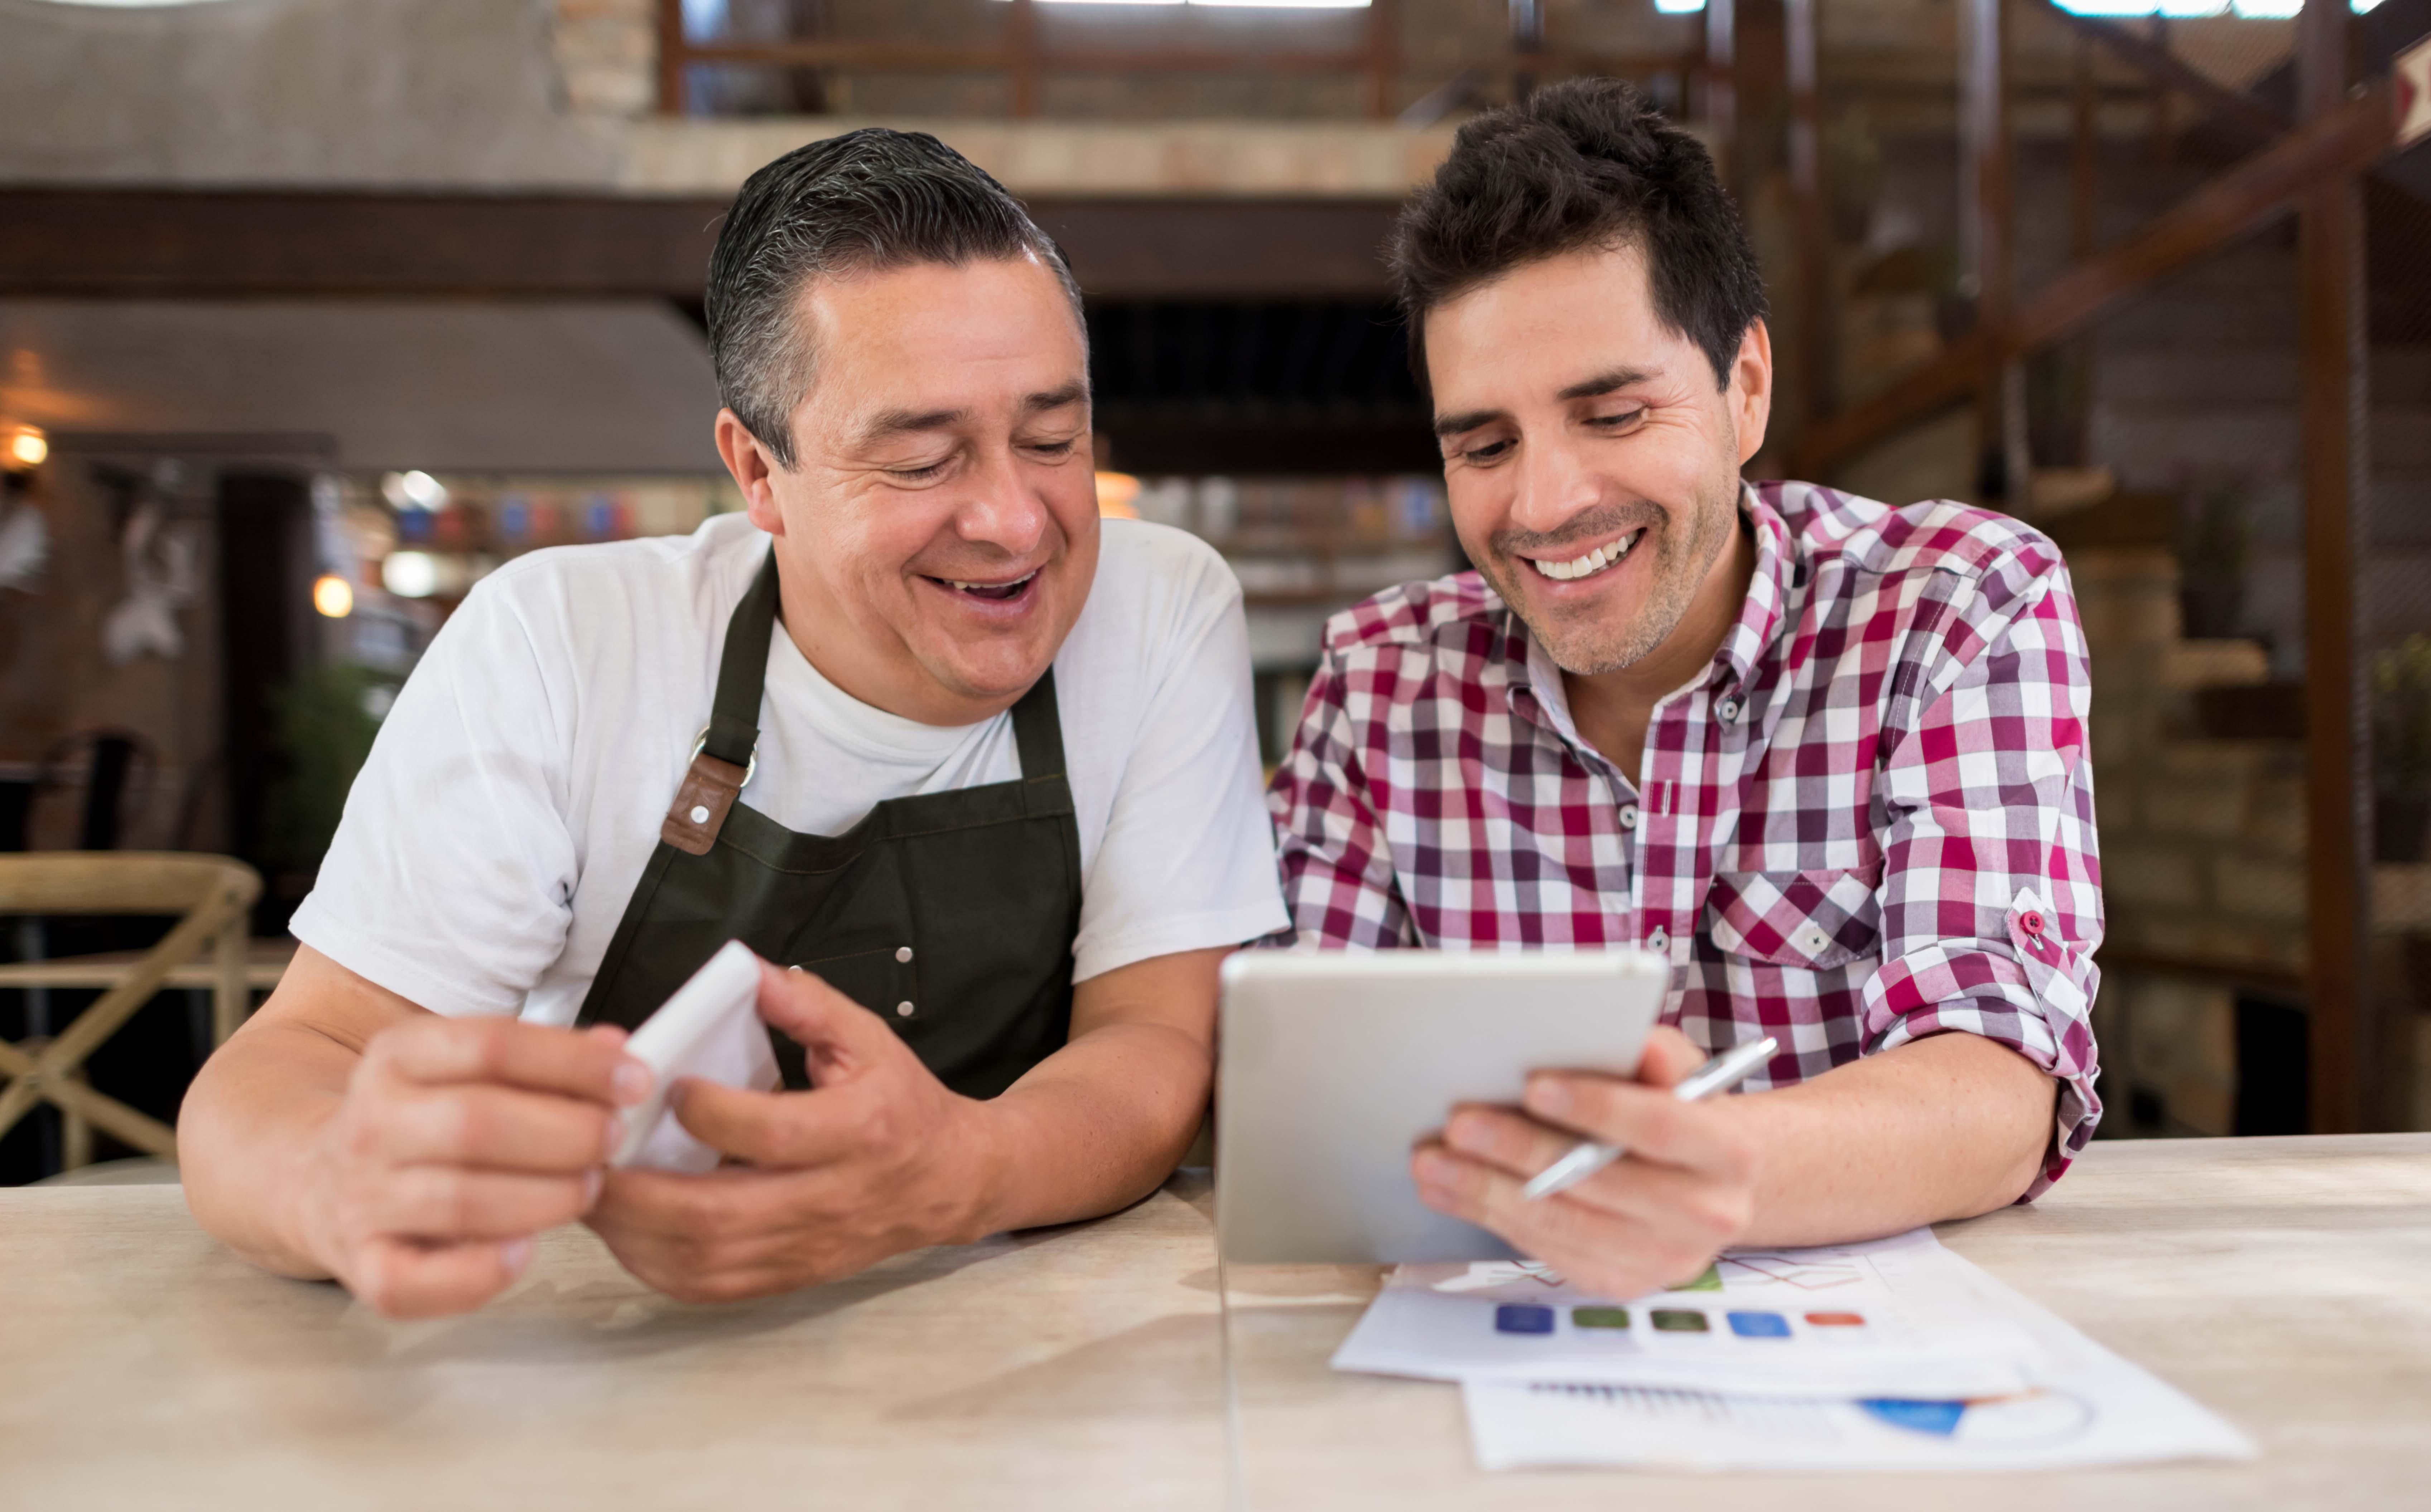 FINANCIAL ADVISORS SPEAK MILLENNIAL